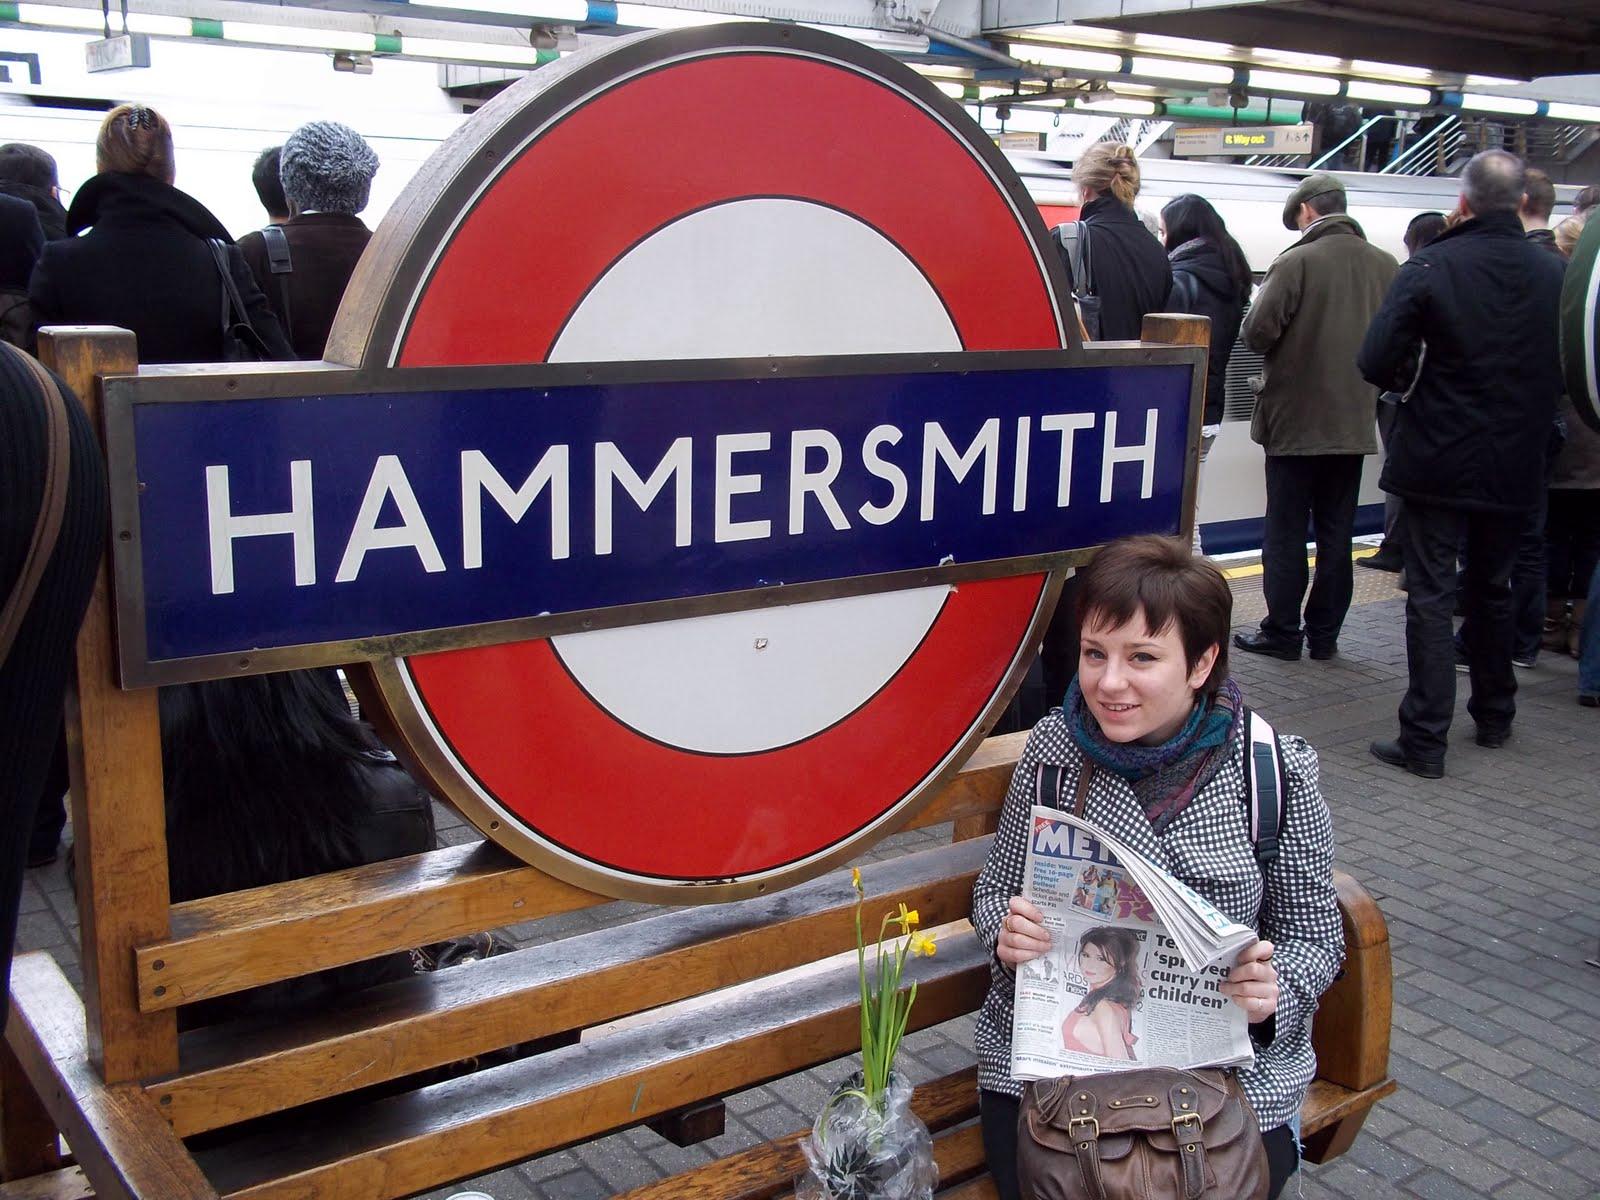 Hammersmith Business Hot Spots